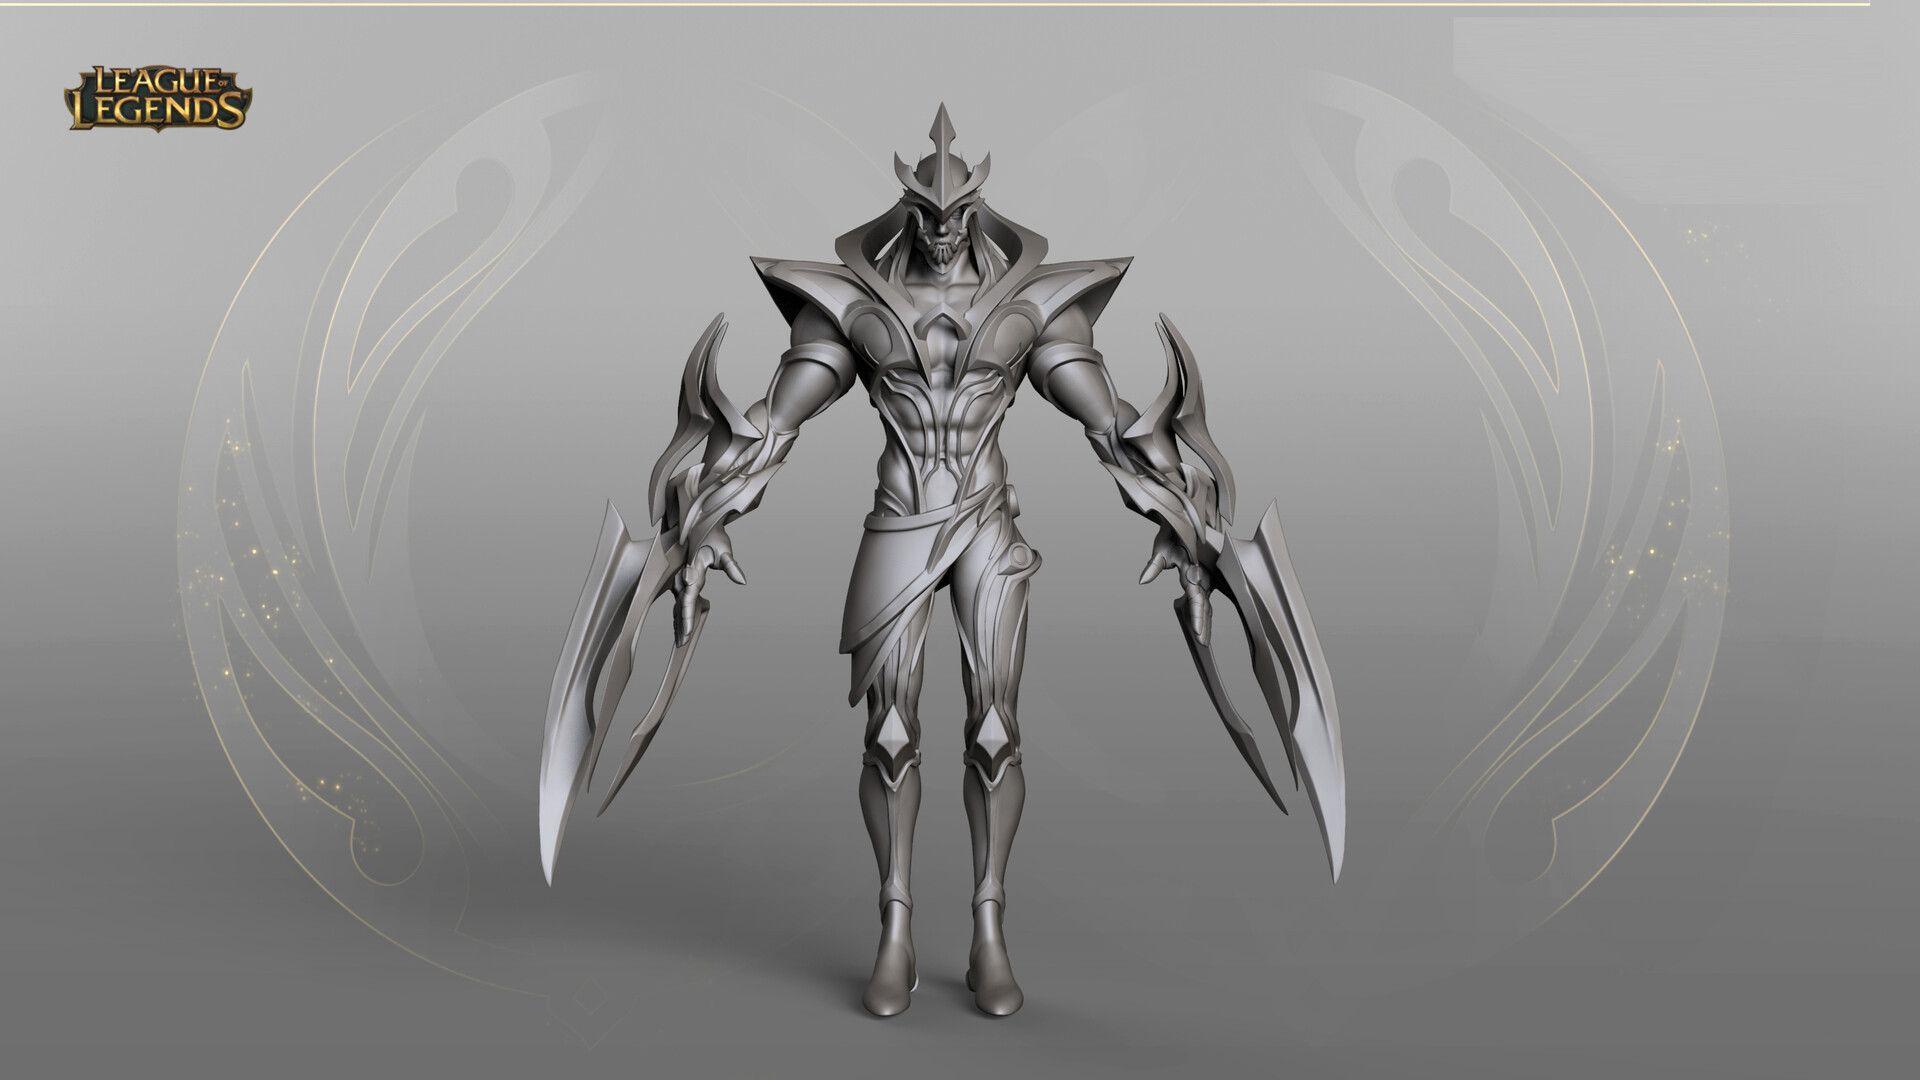 Artstation Galaxy Slayer Zed Duy Khanh Nguyen League Of Legends Game Slayer Artwork